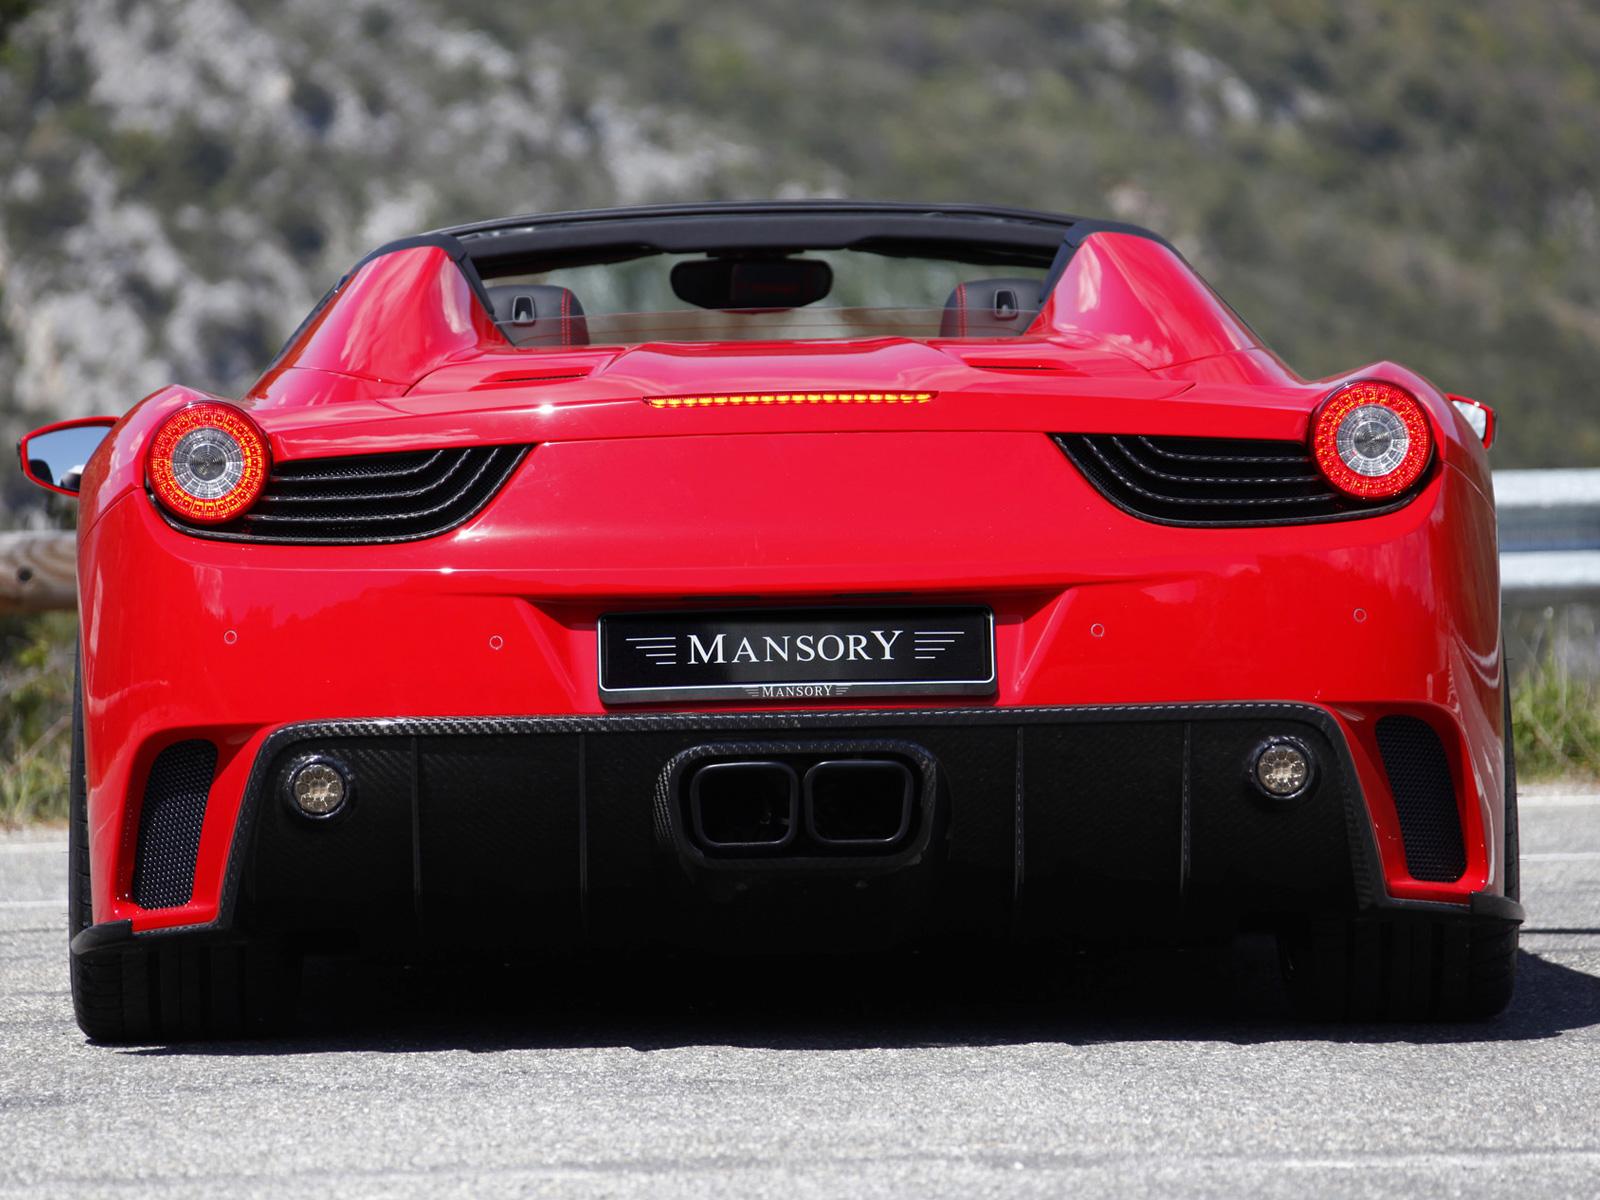 Ferrari 458 Rear Car Wallpaper 1600x1200 16741